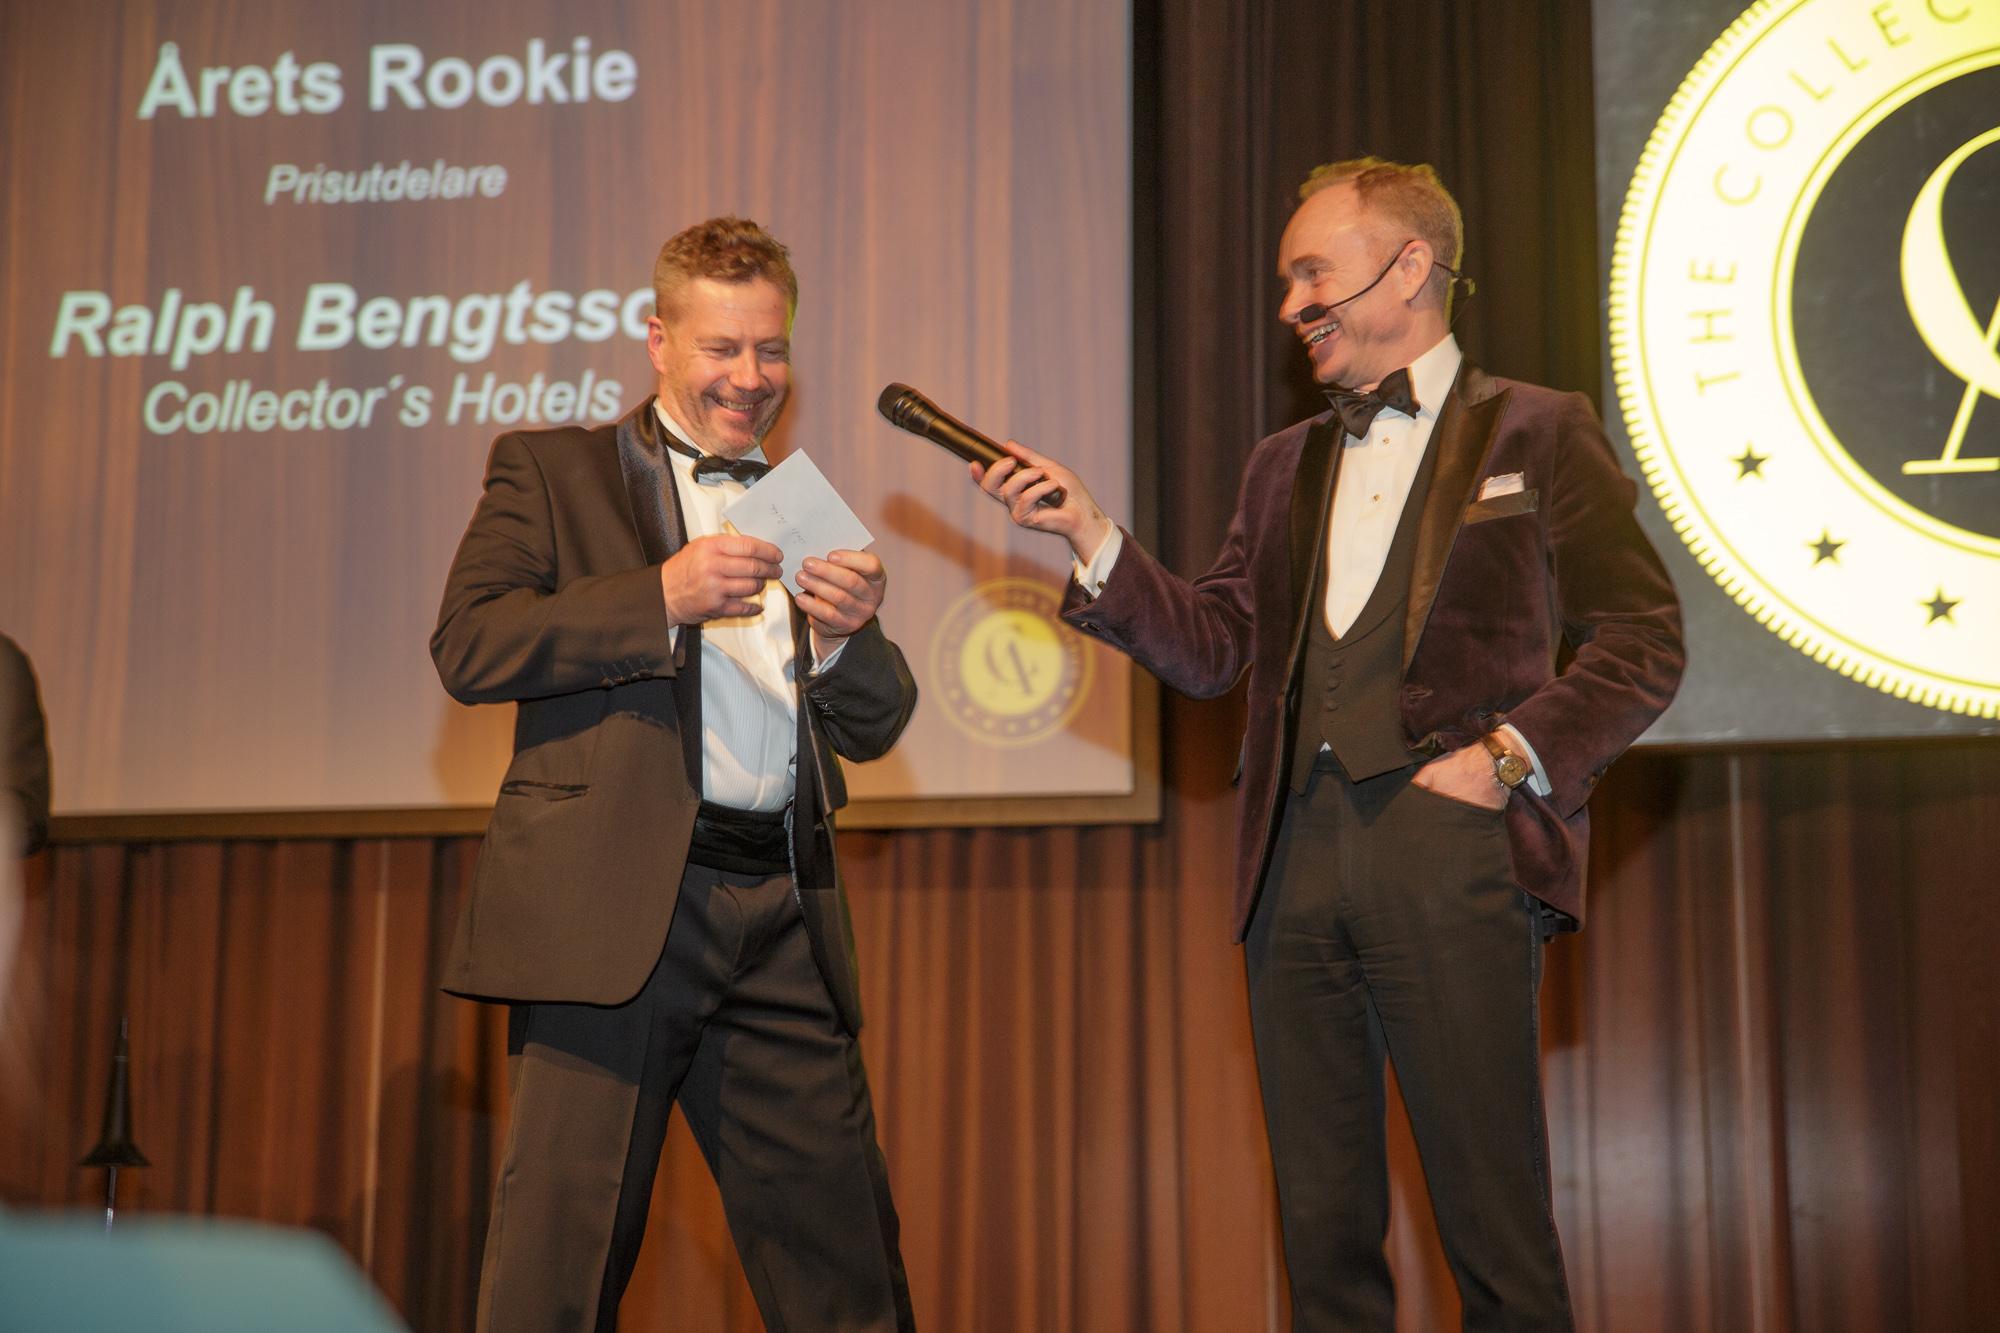 Ralph Bengtsson och Peder Lamm presenterar Årets Rookie